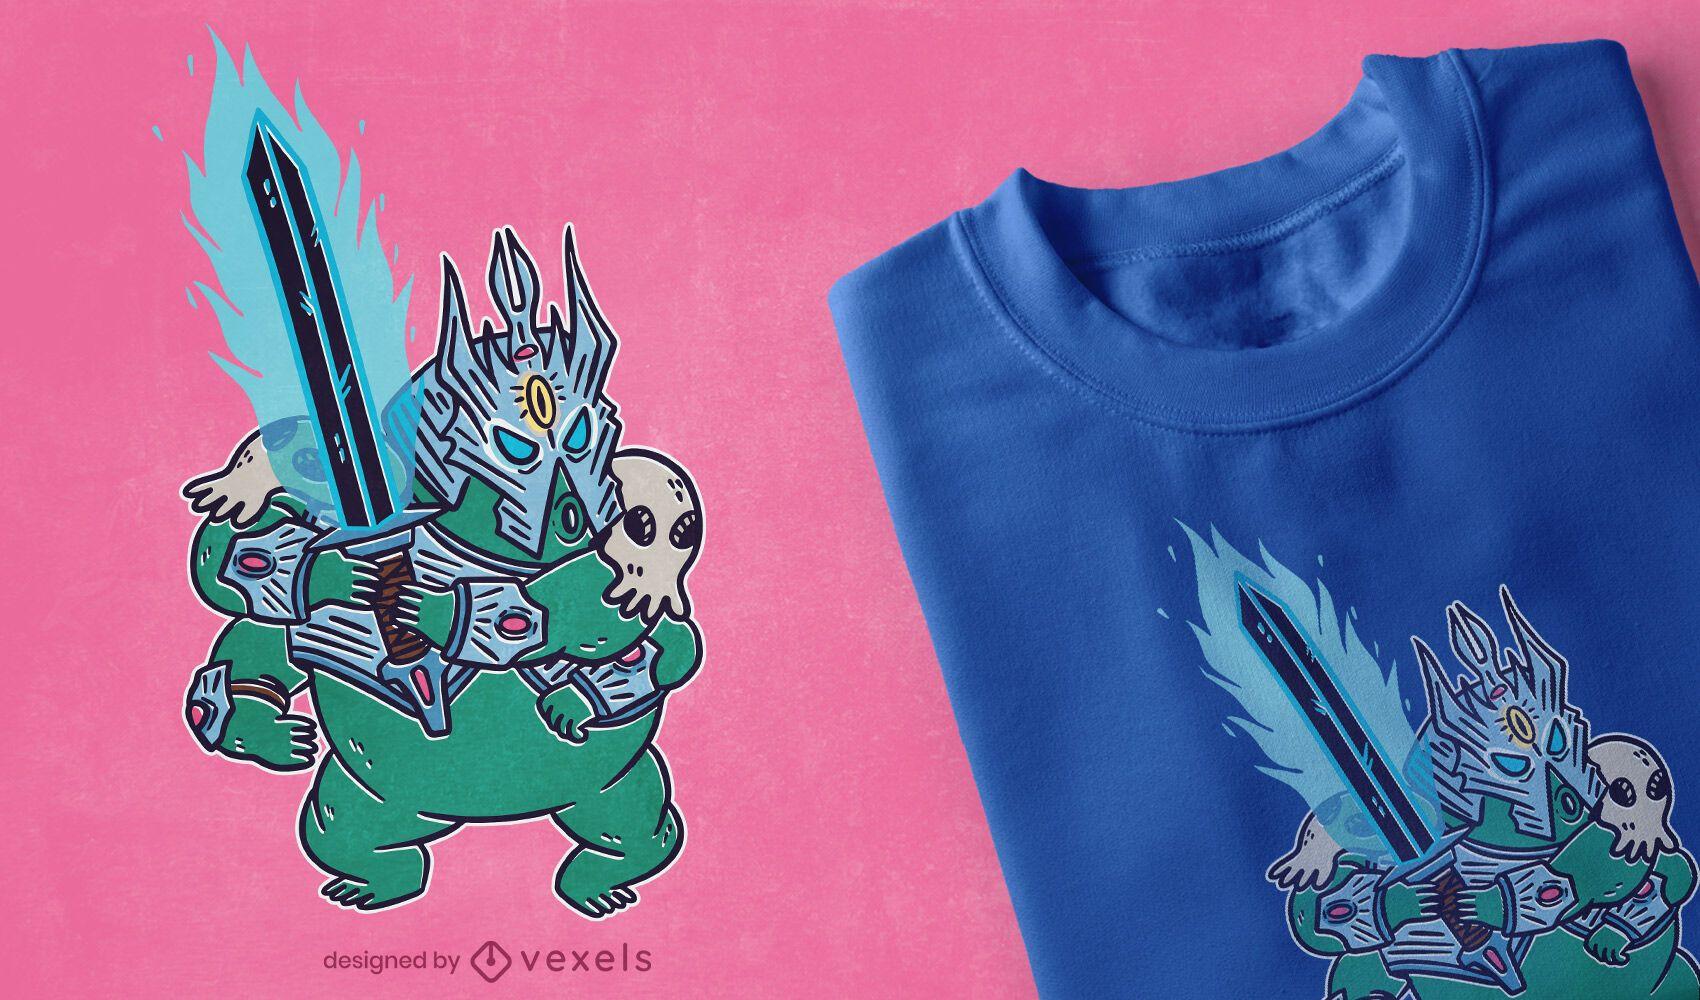 Design de camiseta de RPG do guerreiro Tardígrade